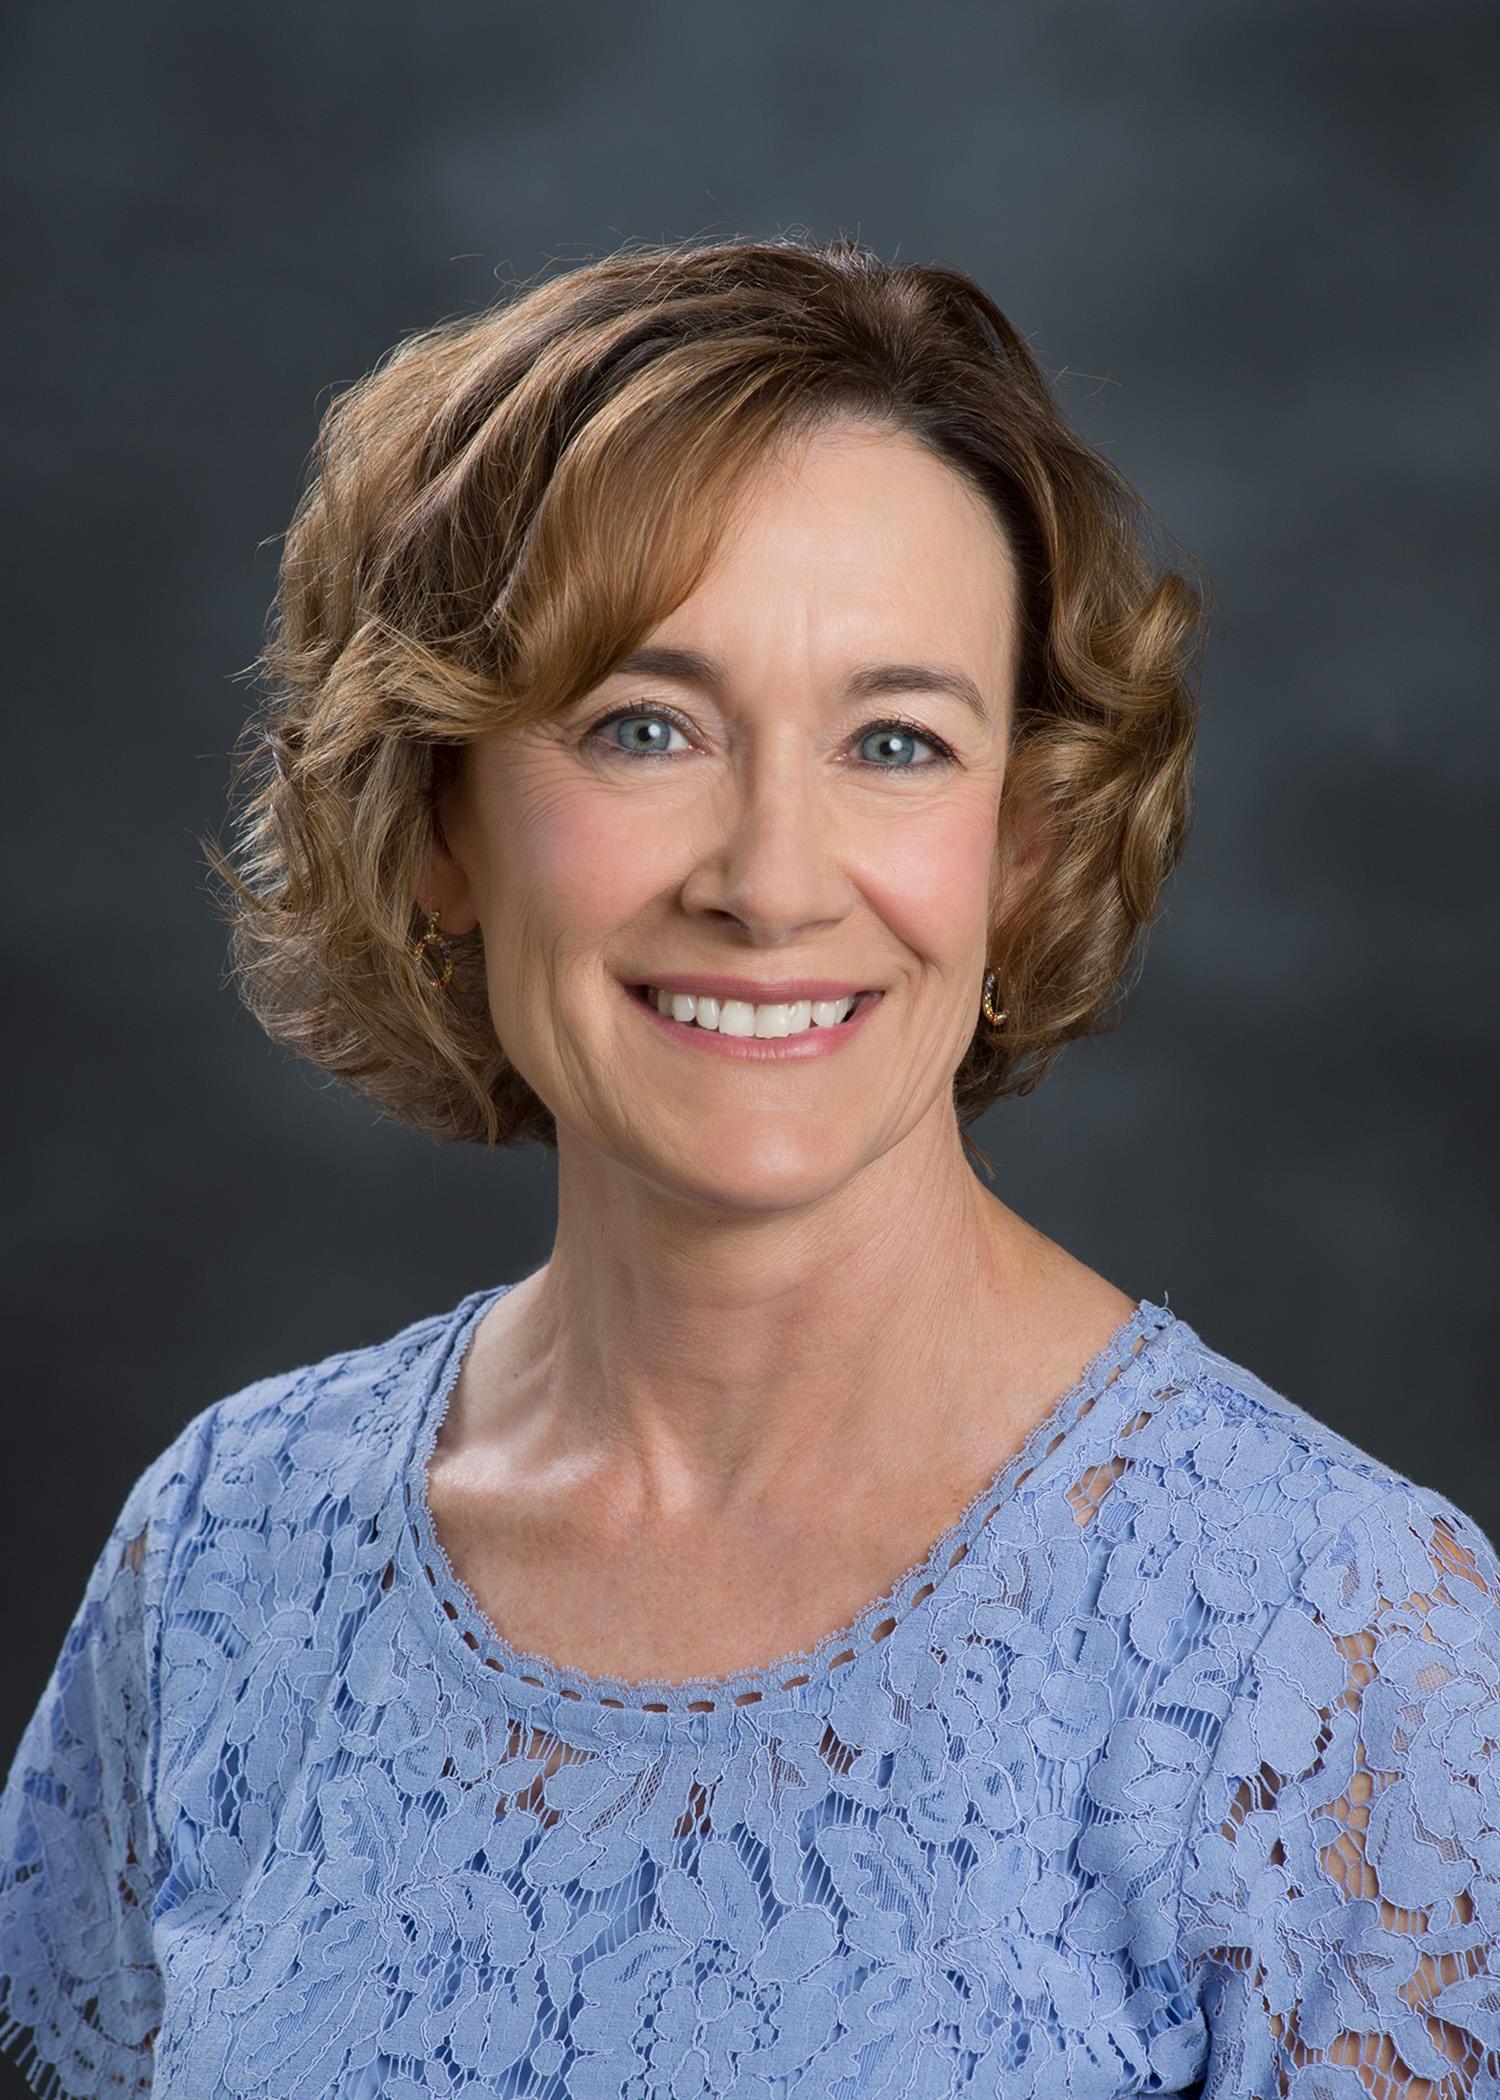 Sharon Thompson, O.D.